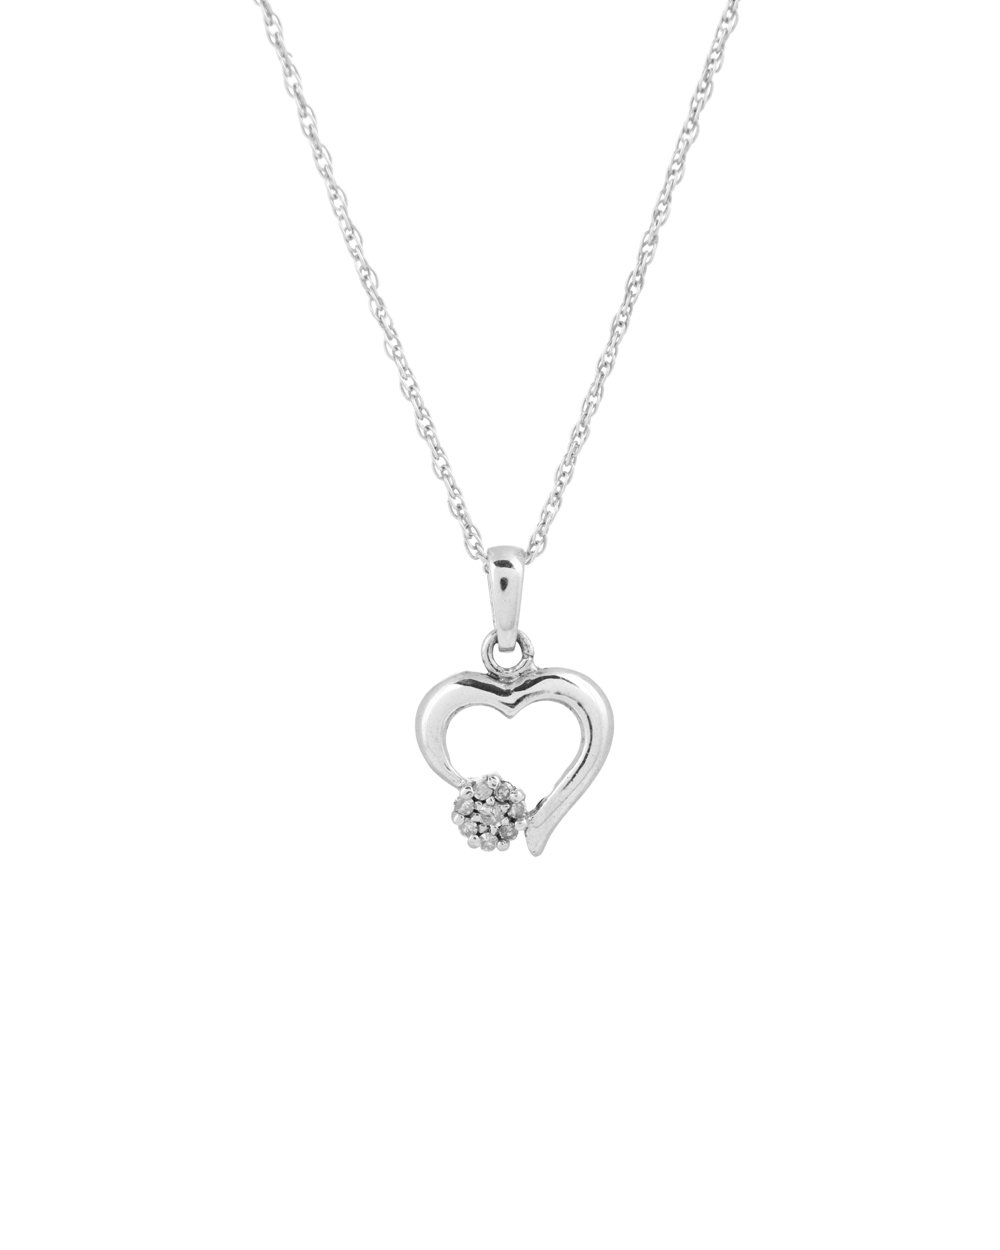 Buy elegant 925 sterling silver heart shaped diamond pendant with elegant 925 sterling silver heart shaped diamond pendant with chain mozeypictures Images